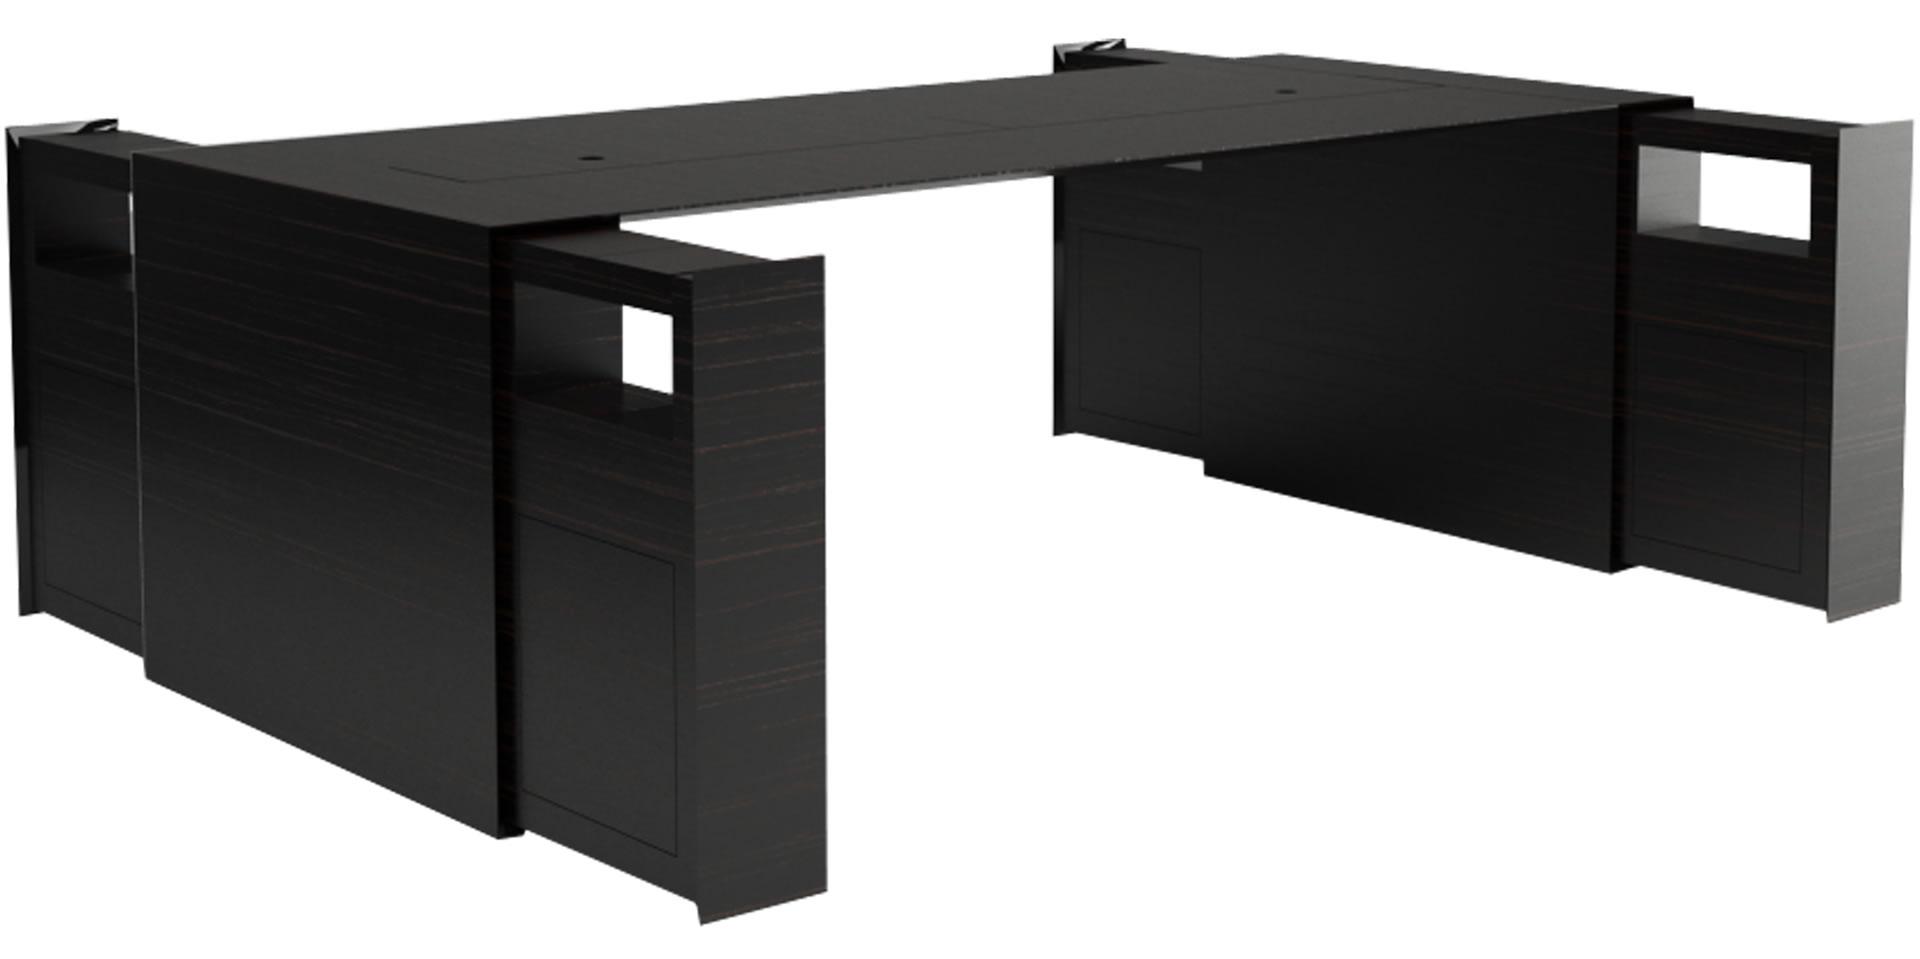 Besprechungstisch summarum wei er design besprechungs for Schreibtisch dreieckig